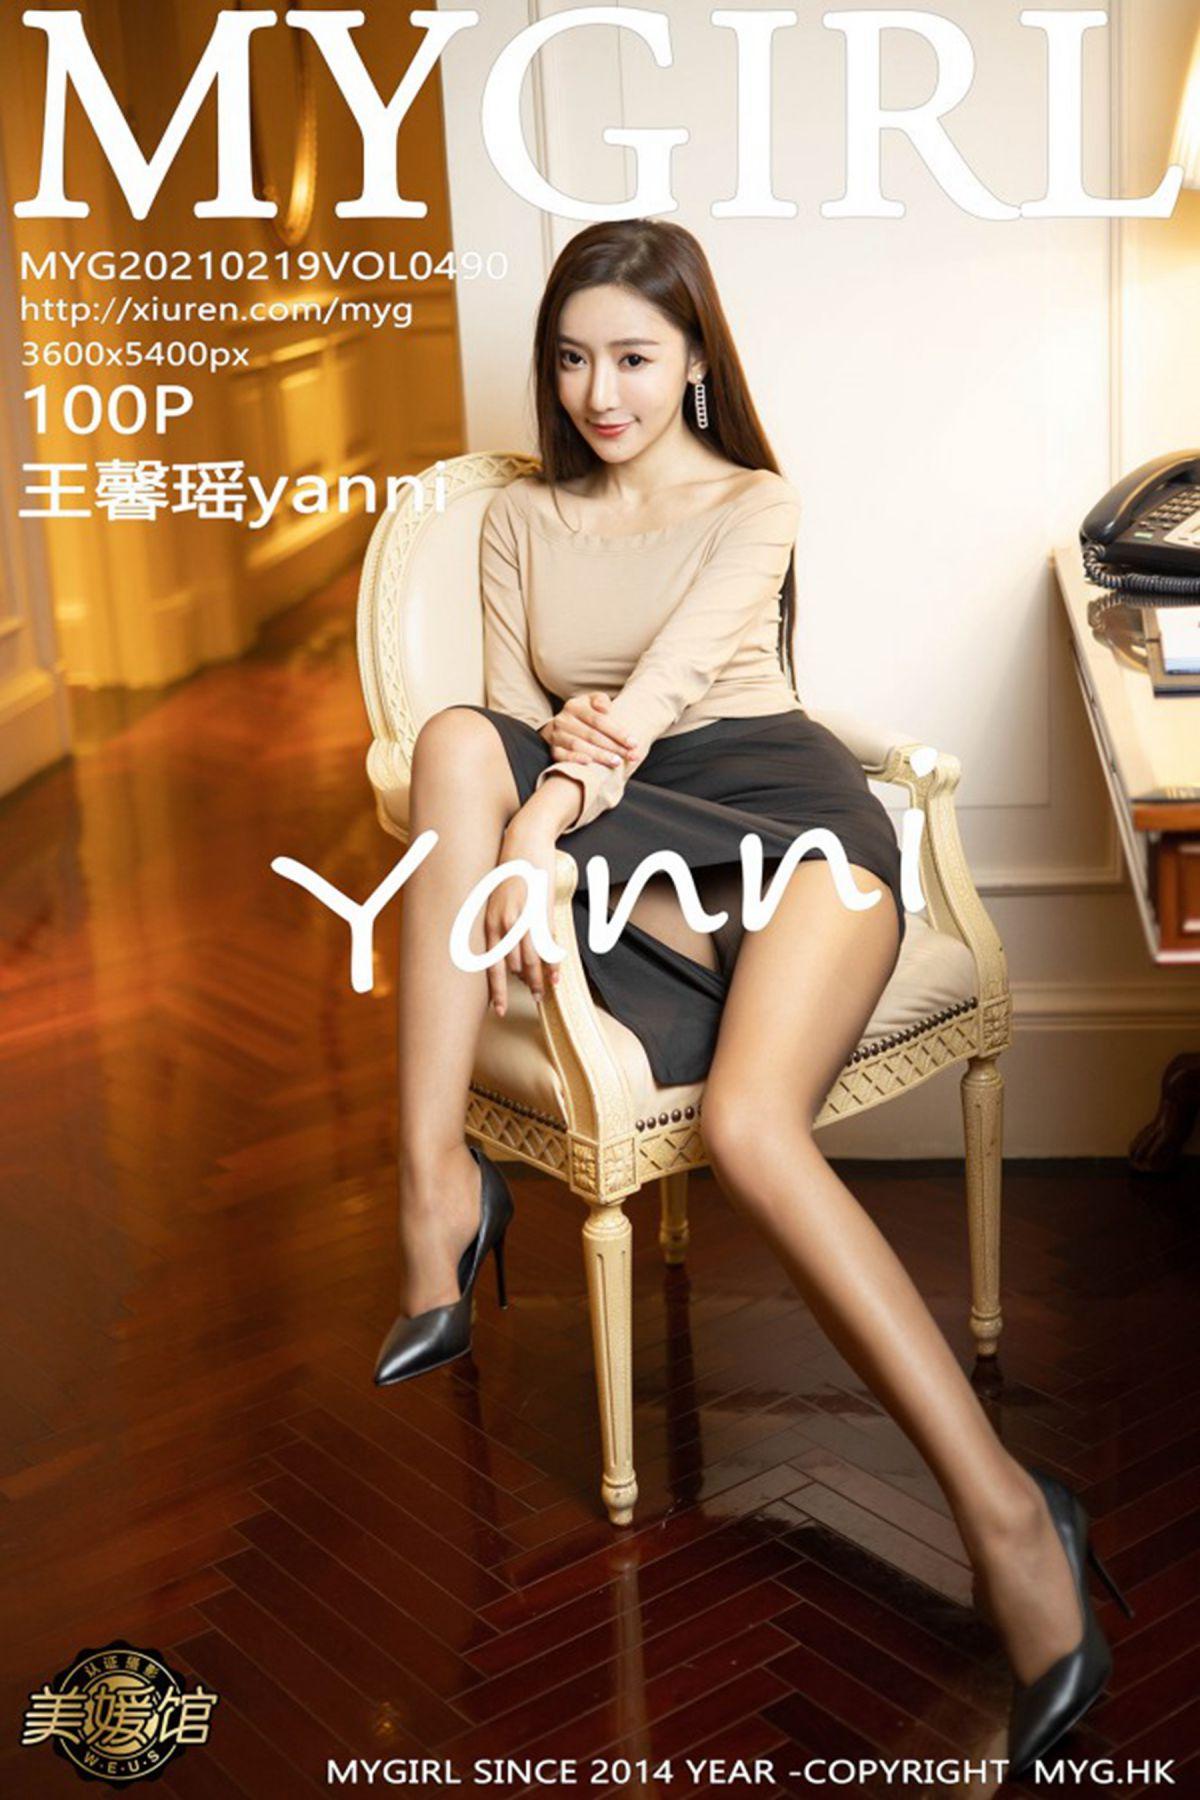 MyGirl美媛馆 Vol.490 Wang Xin Yao